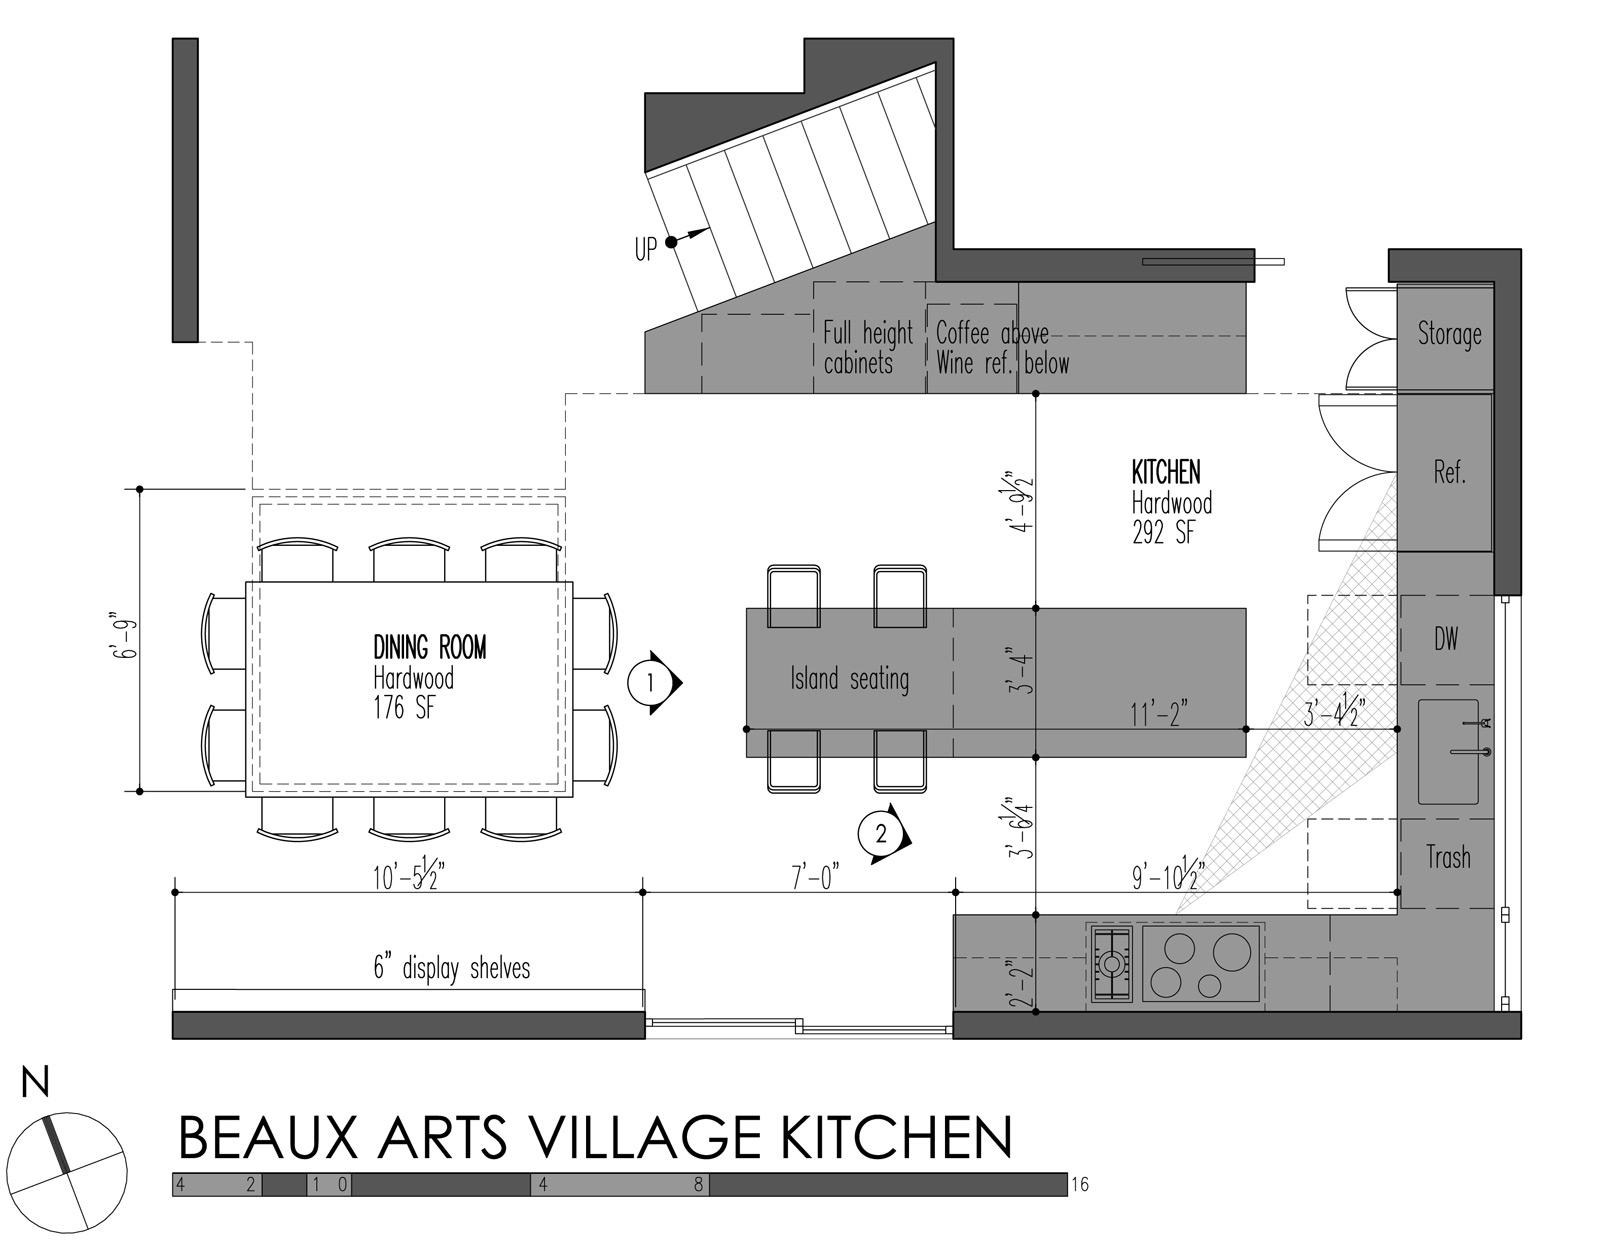 Prissy Build Llc Beaux Arts Village Kitchen Plan Standard Kitchen Plan Standard Kitchen Setup kitchen Standard Kitchen Layouts